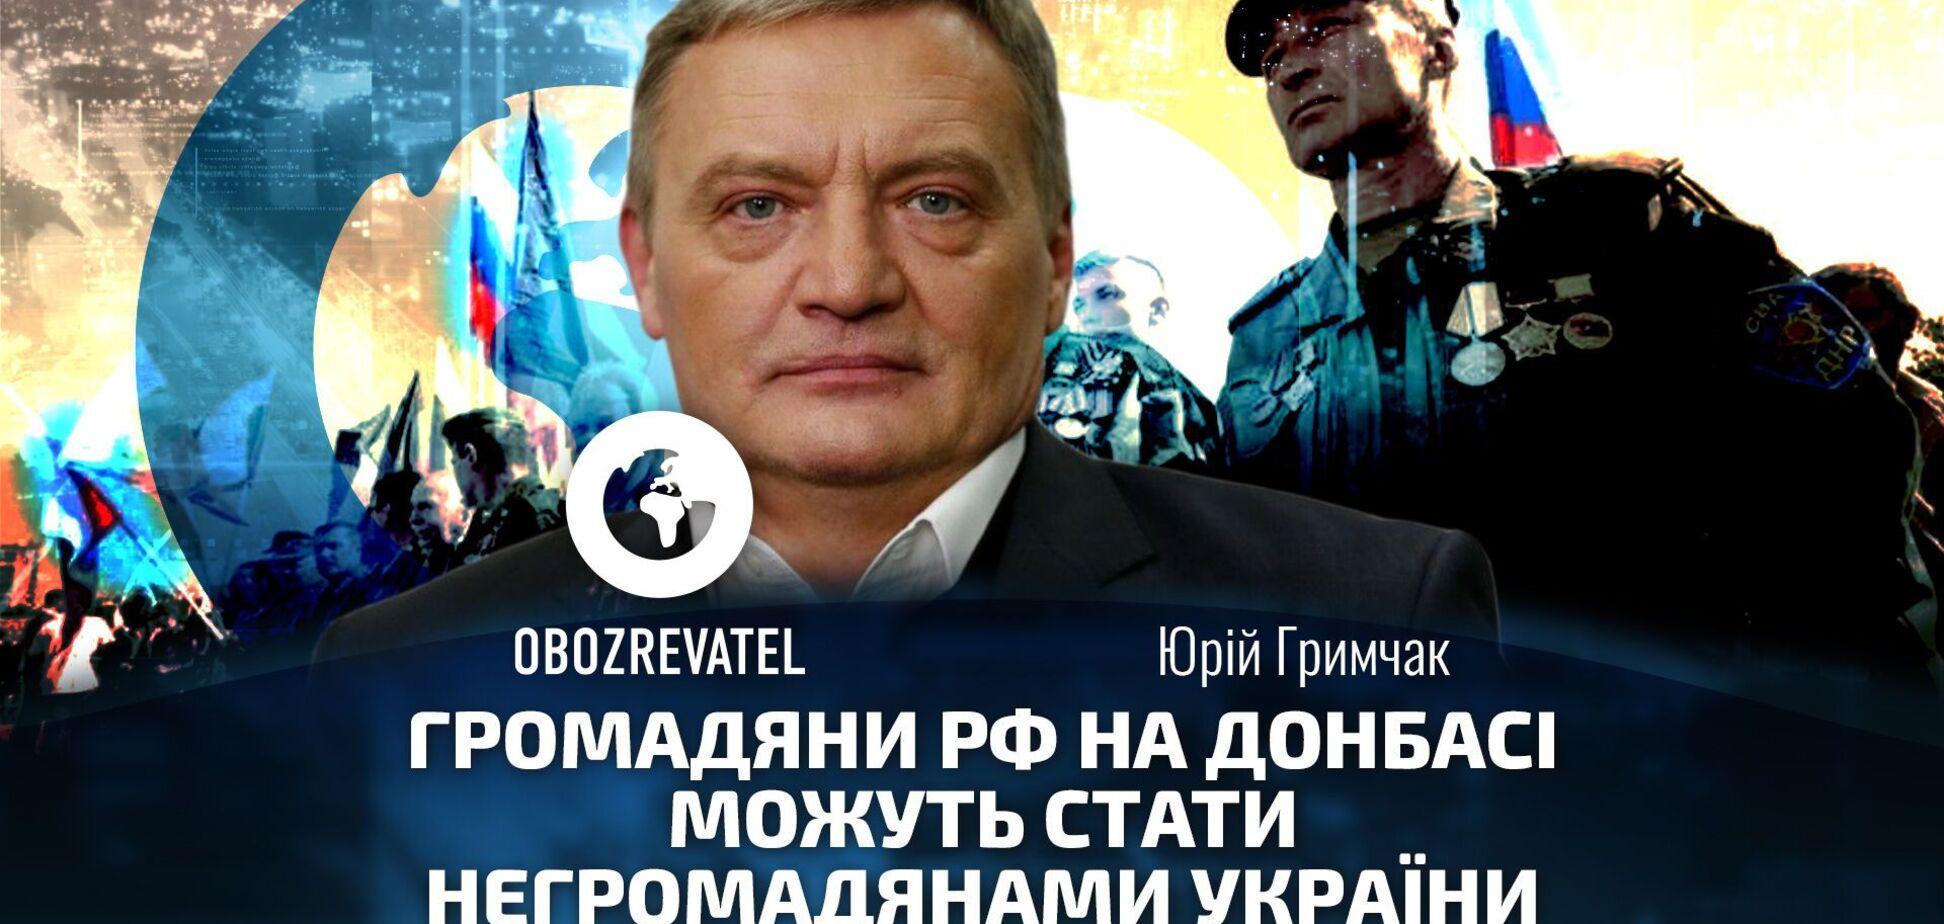 Гримчак: жителі Донбасу можуть стати 'негромадянами'